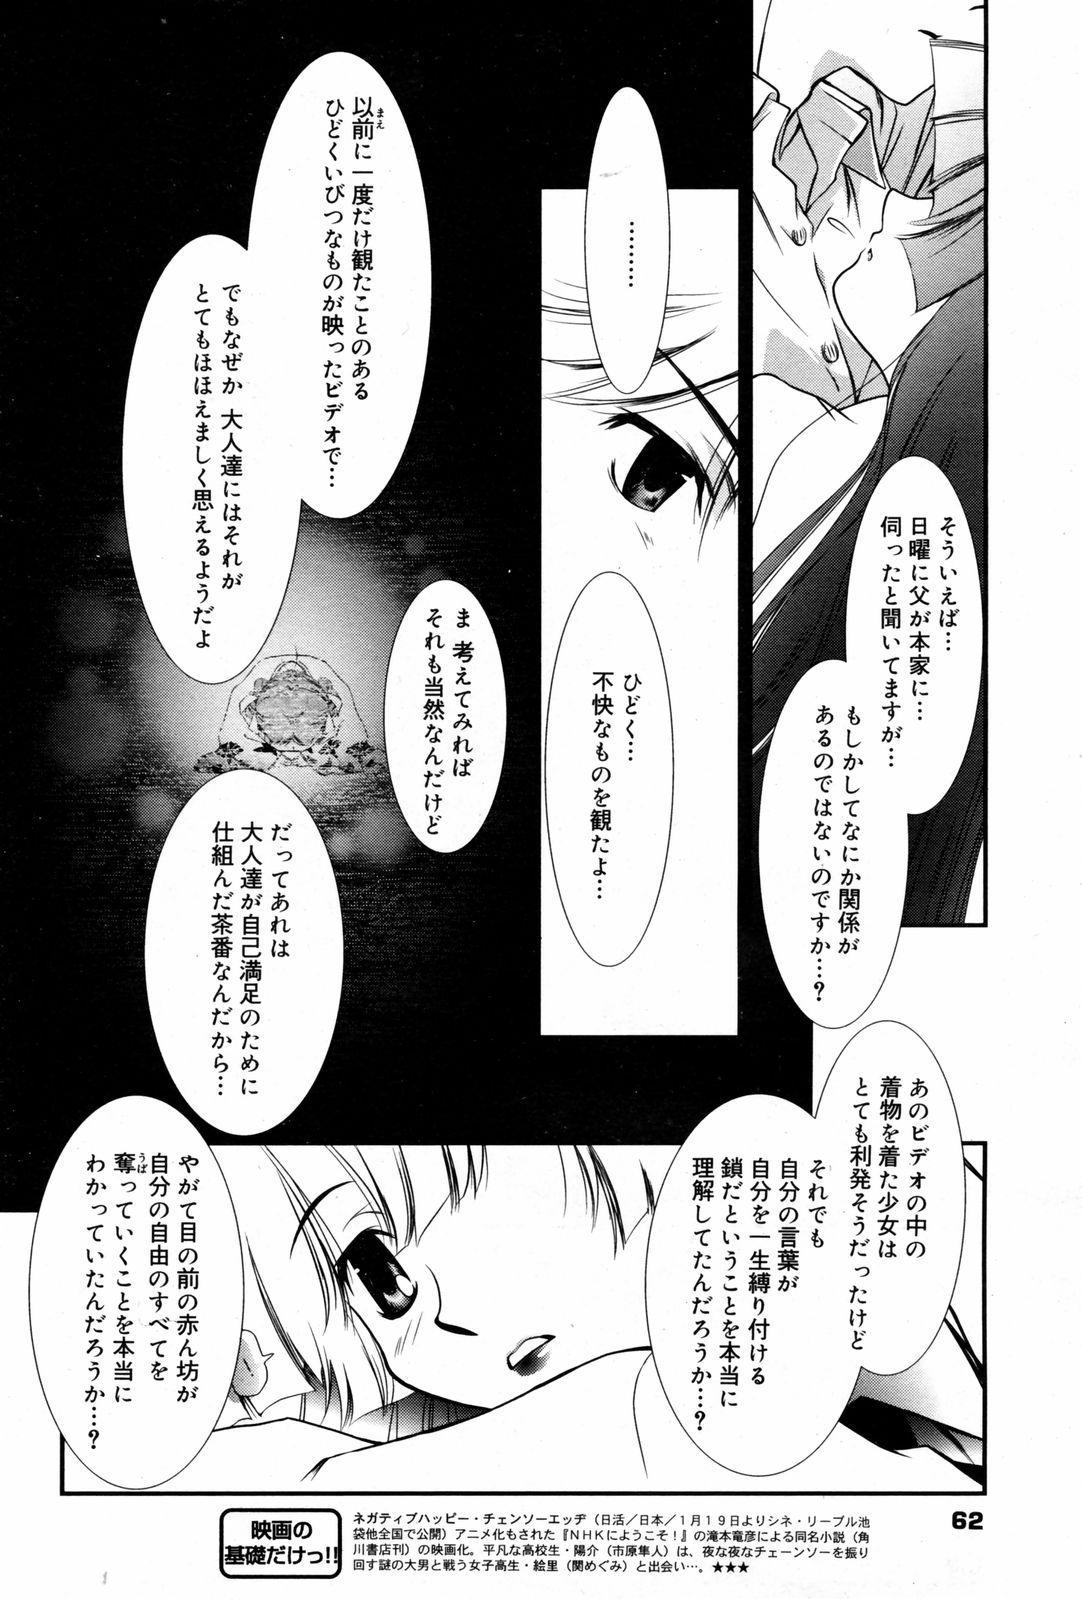 Manga Bangaichi 2008-03 61